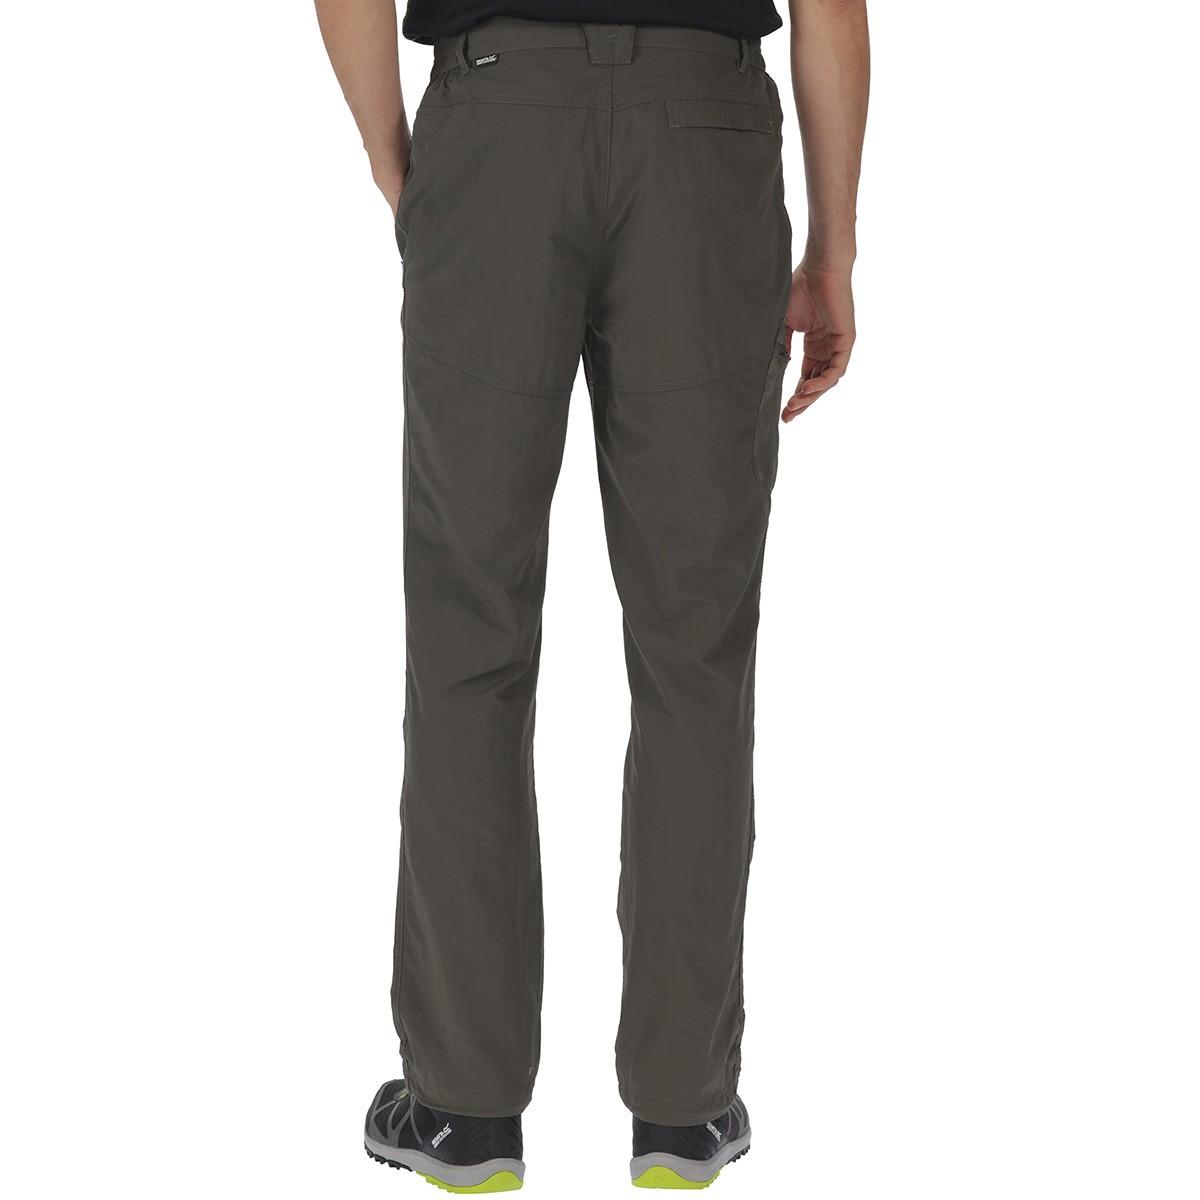 Regatta-Great-Outdoors-Mens-Leesville-Waterproof-Softshell-Trousers